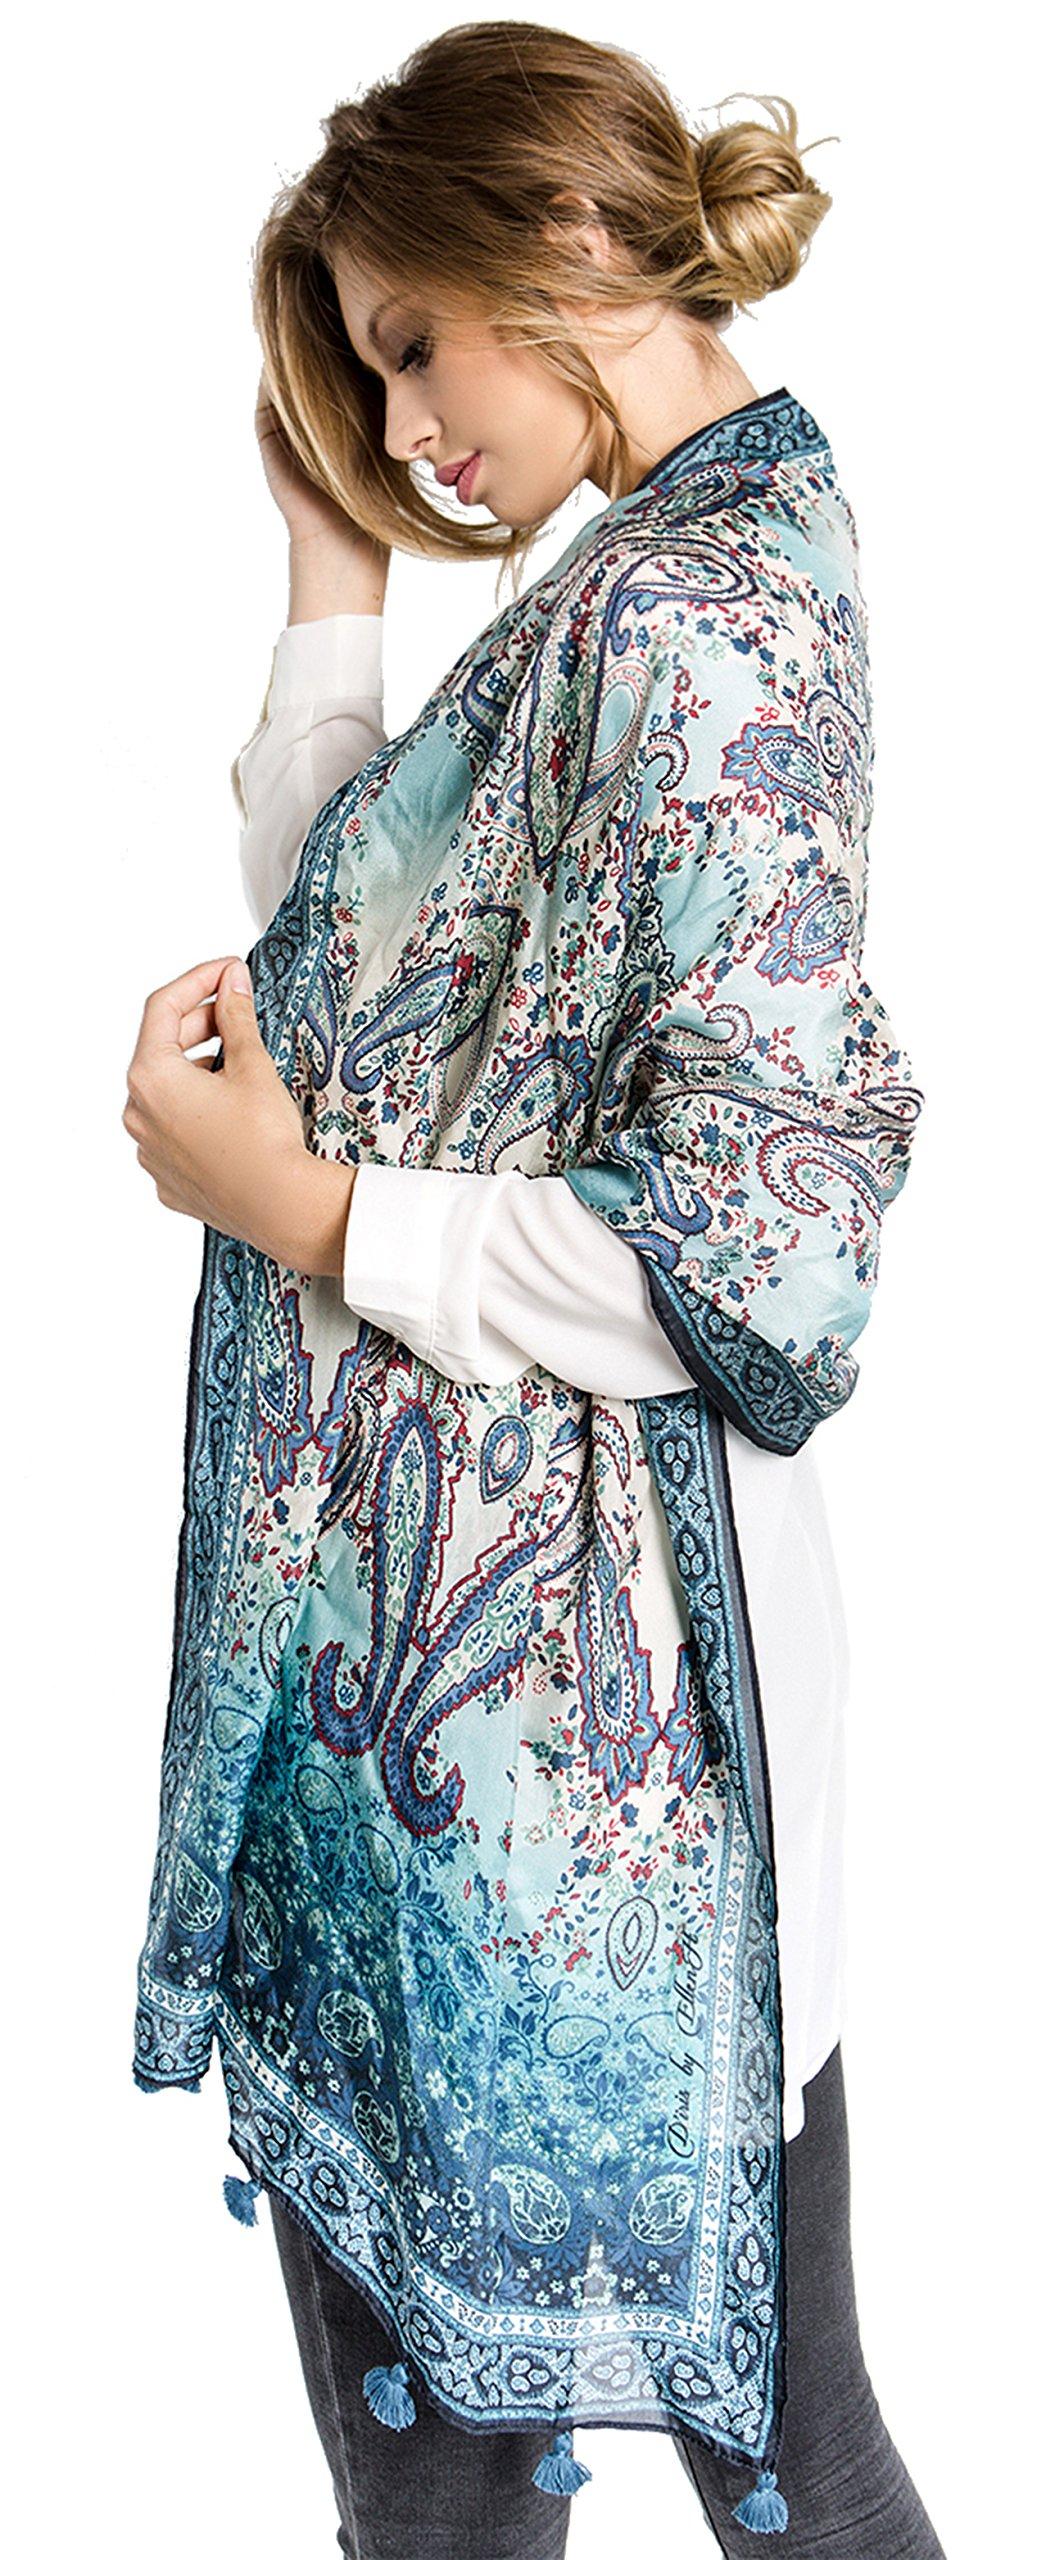 Fine Silk Scarf for Women-Luxury Fashion Print Extra Long Lightweight Wrap Shawl Headscarf by d'IRIS (Image #3)